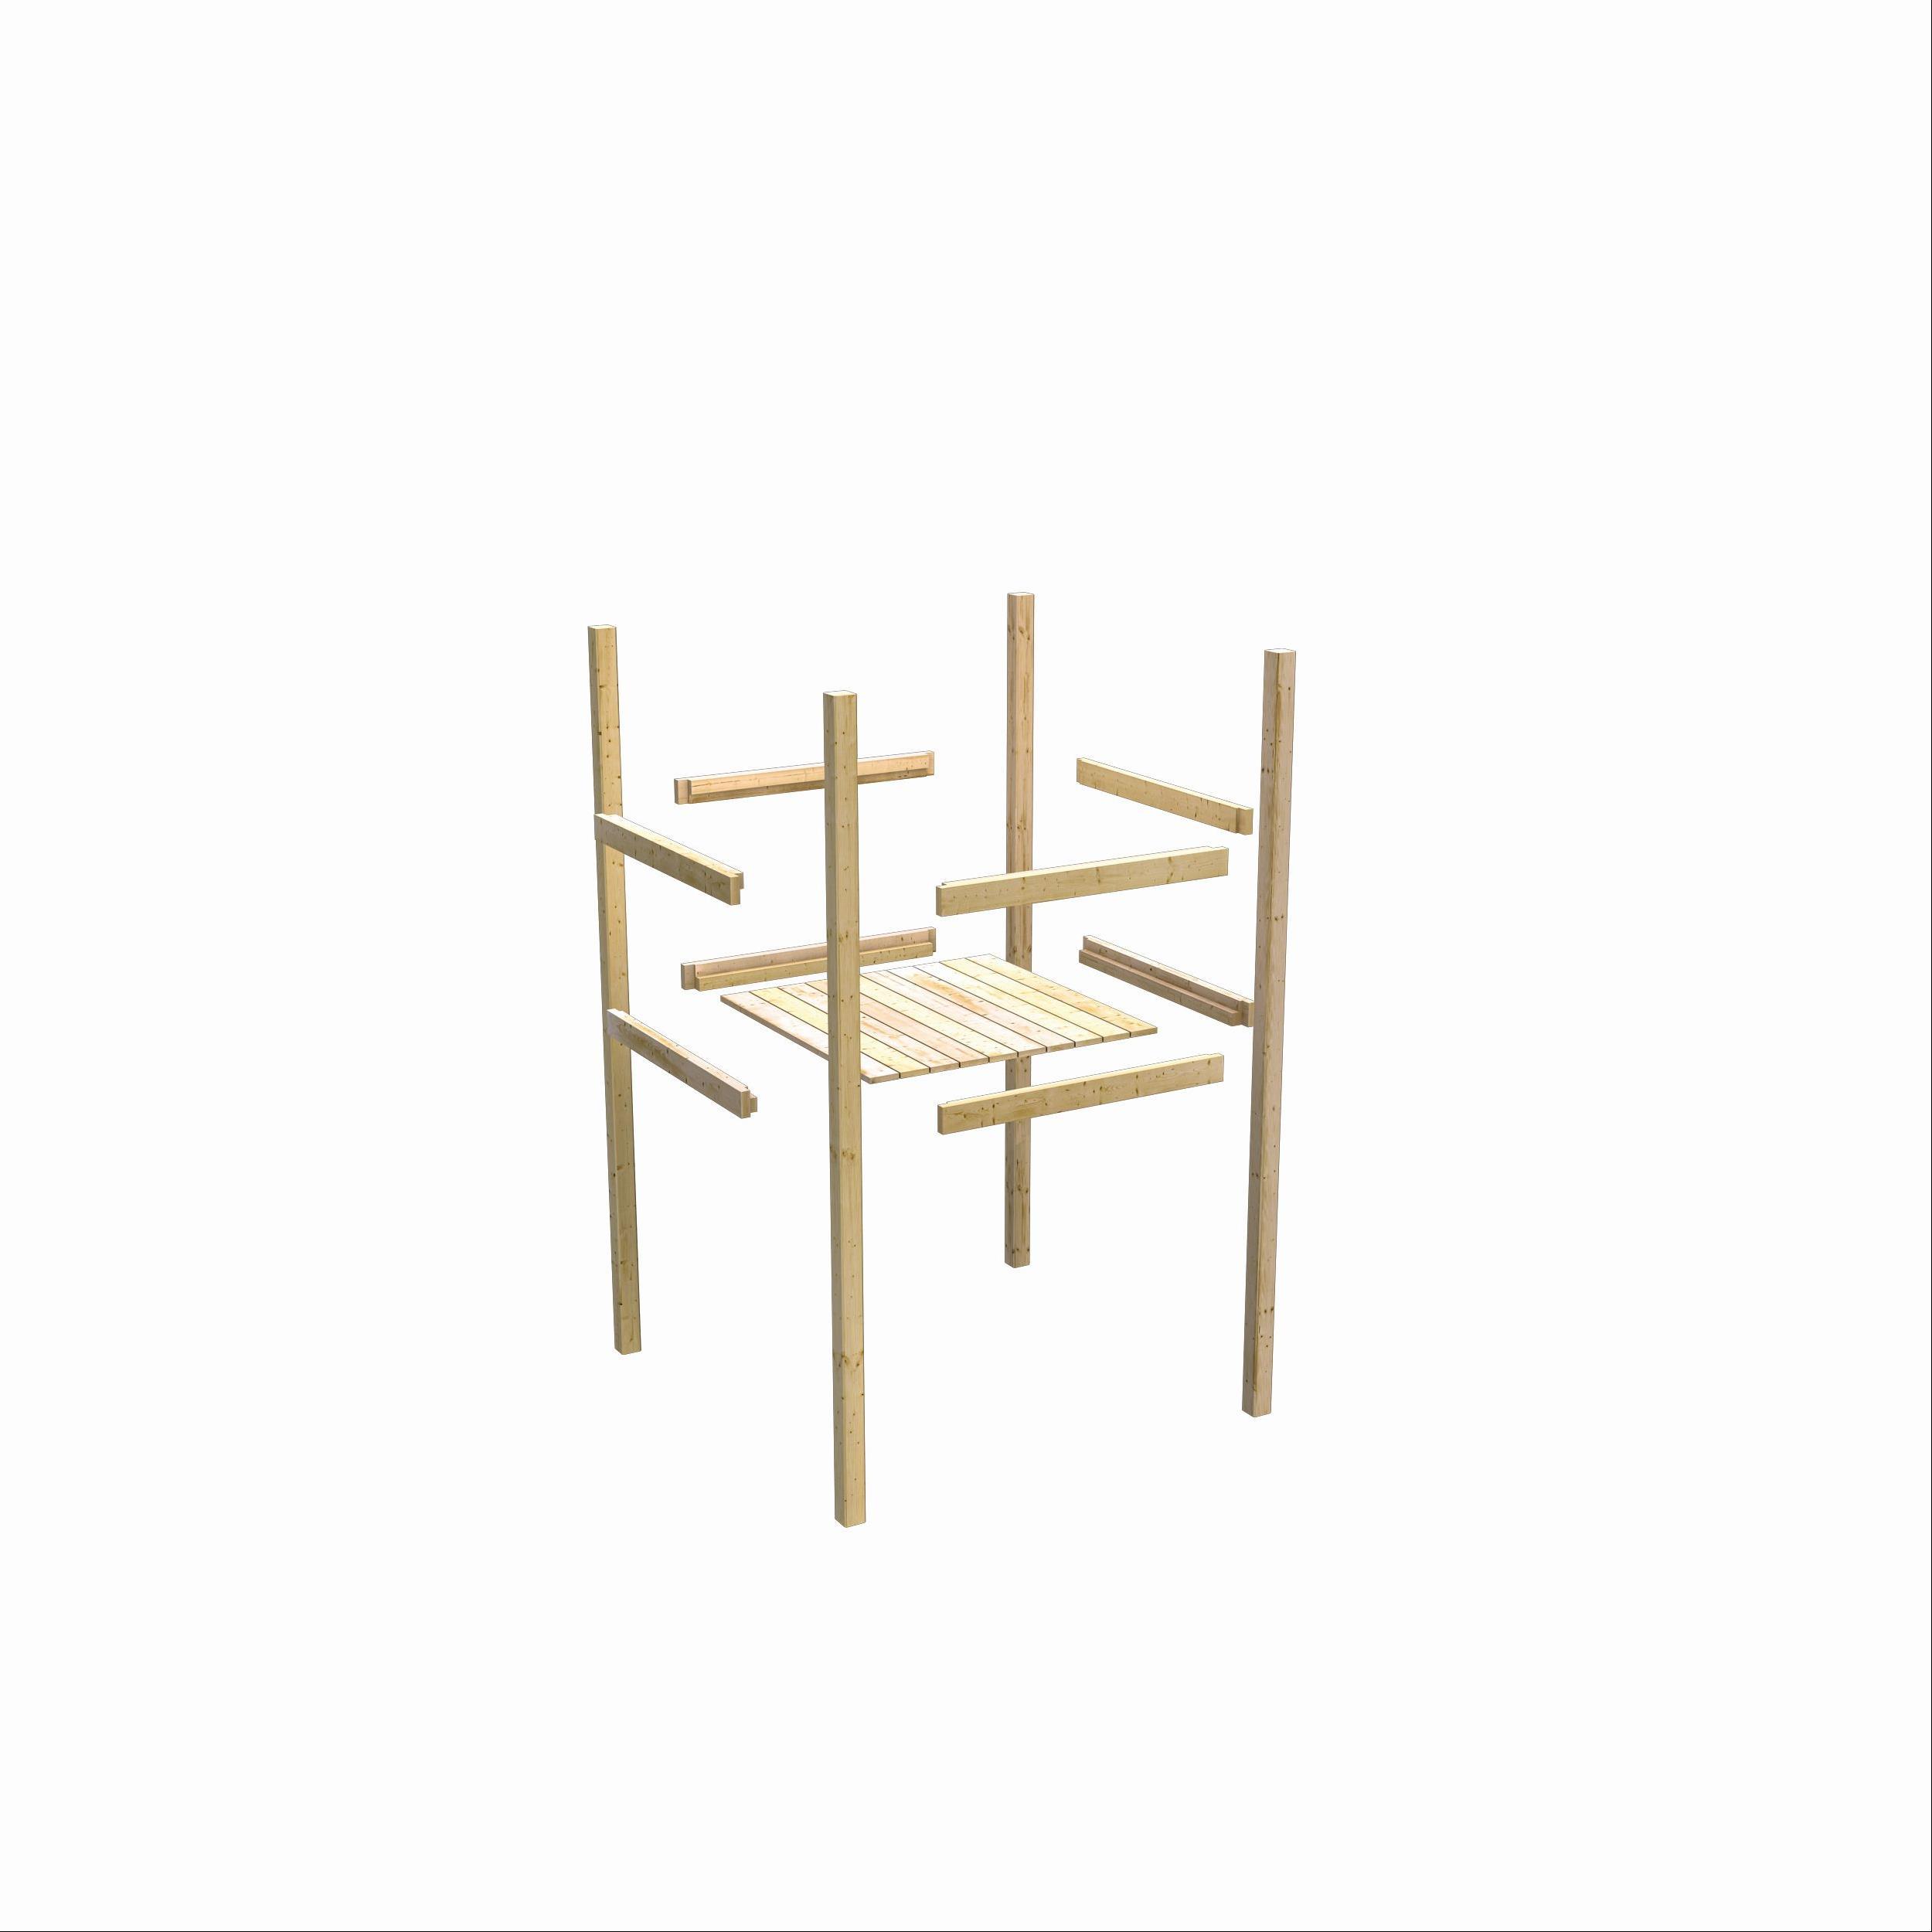 Spielturm / Kletterturm Karibu Akubi Luis Set A Rutsche grün 217x205cm Bild 6